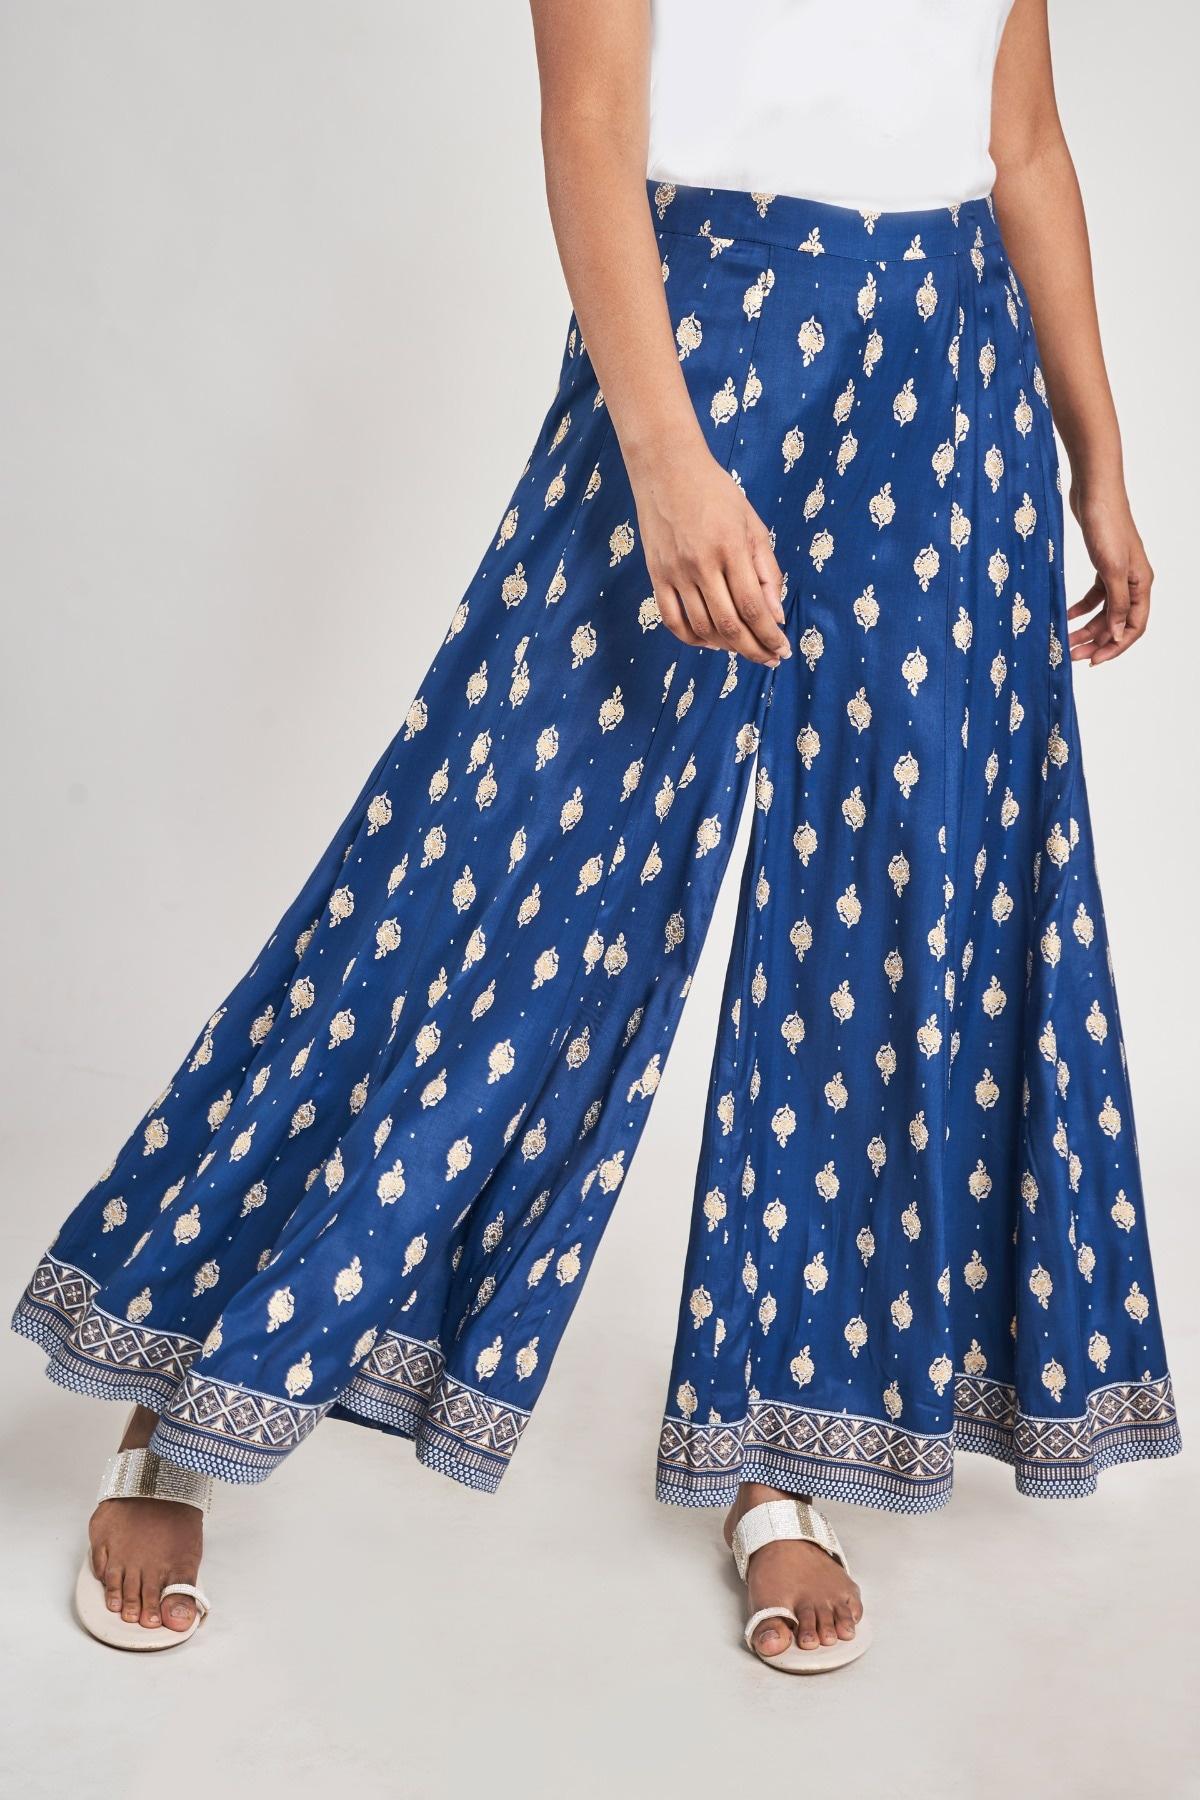 Global Desi   Dark Blue Floral Printed A-Line Bottom